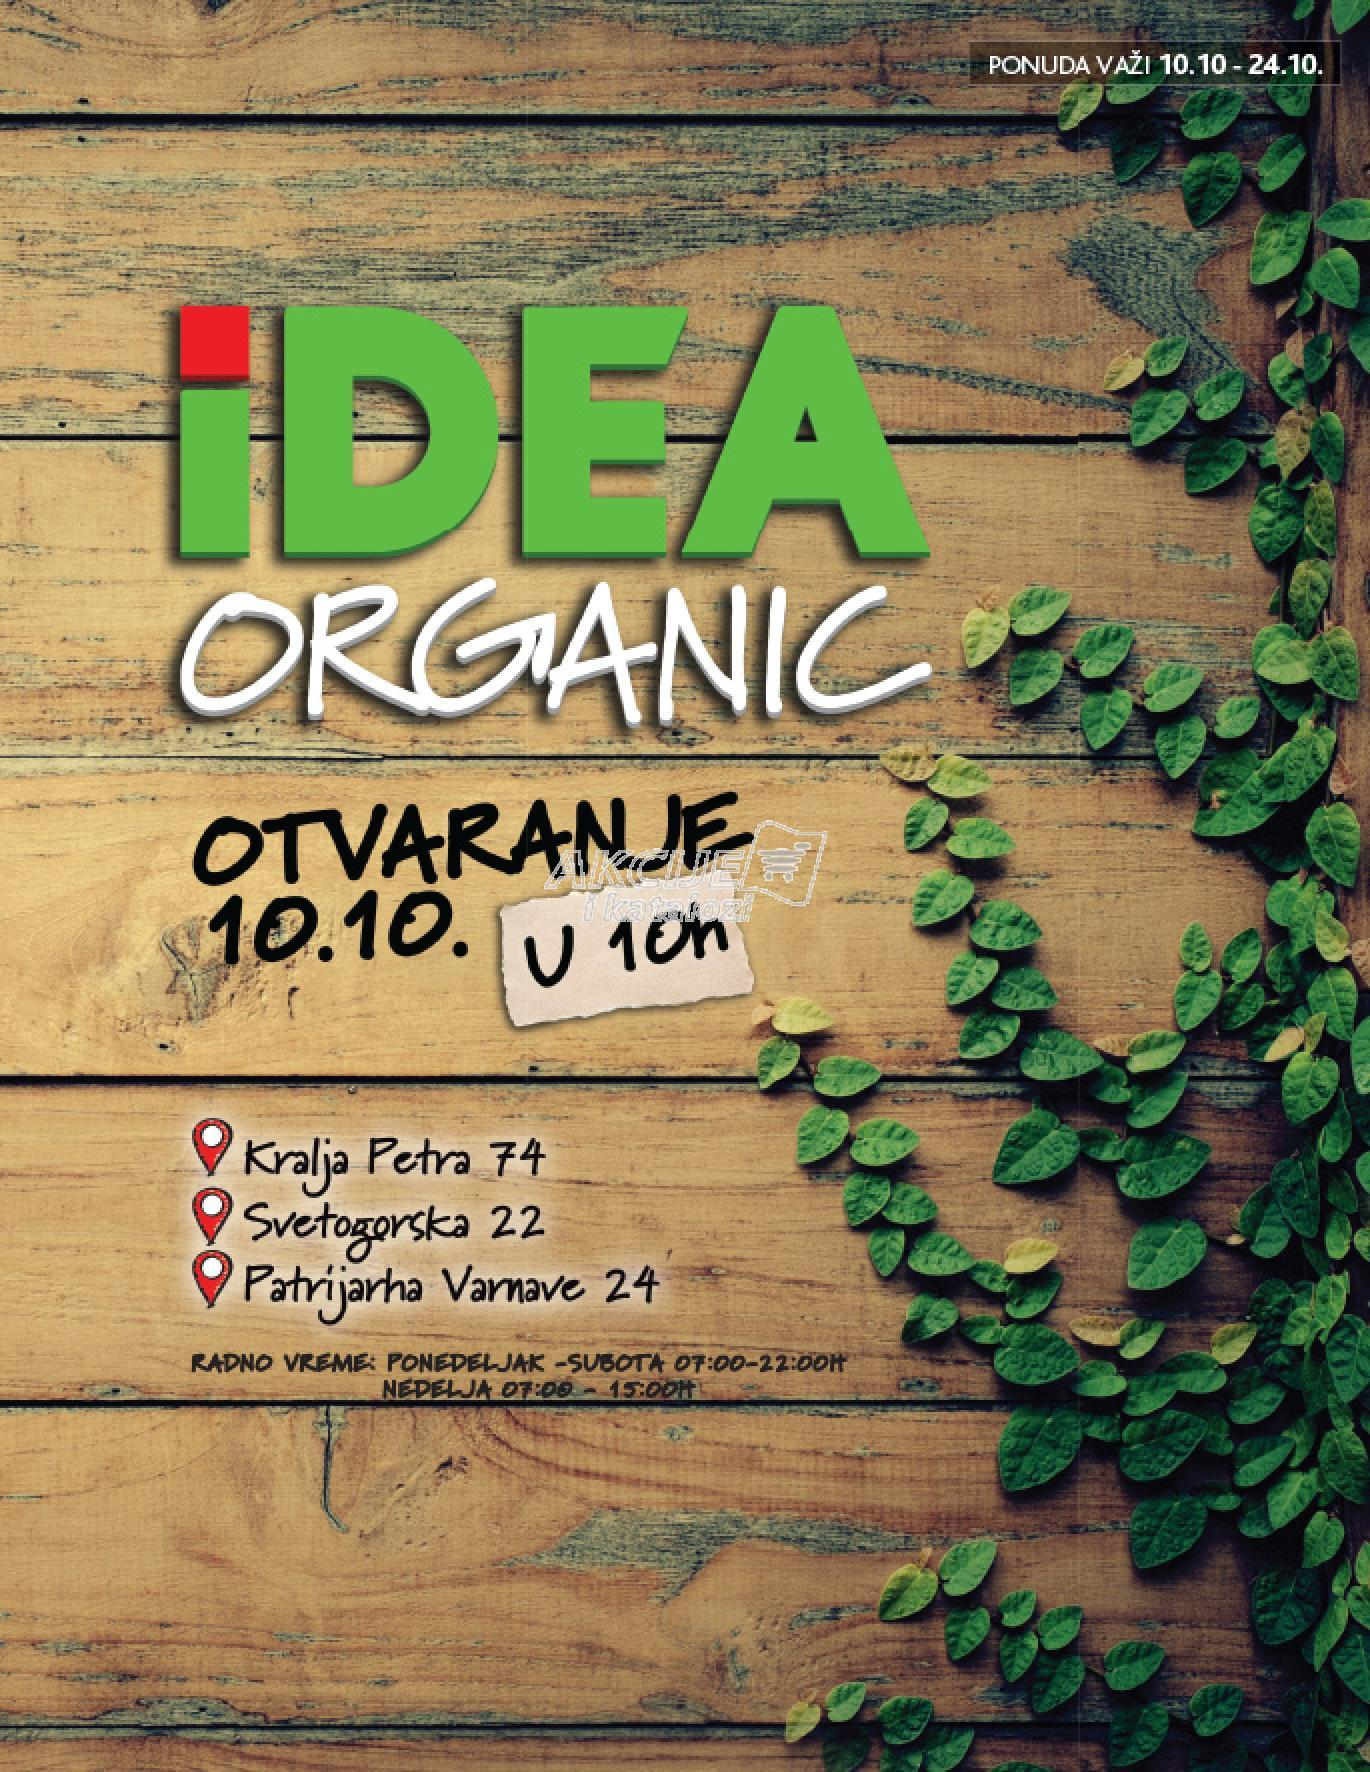 Idea akcija organic